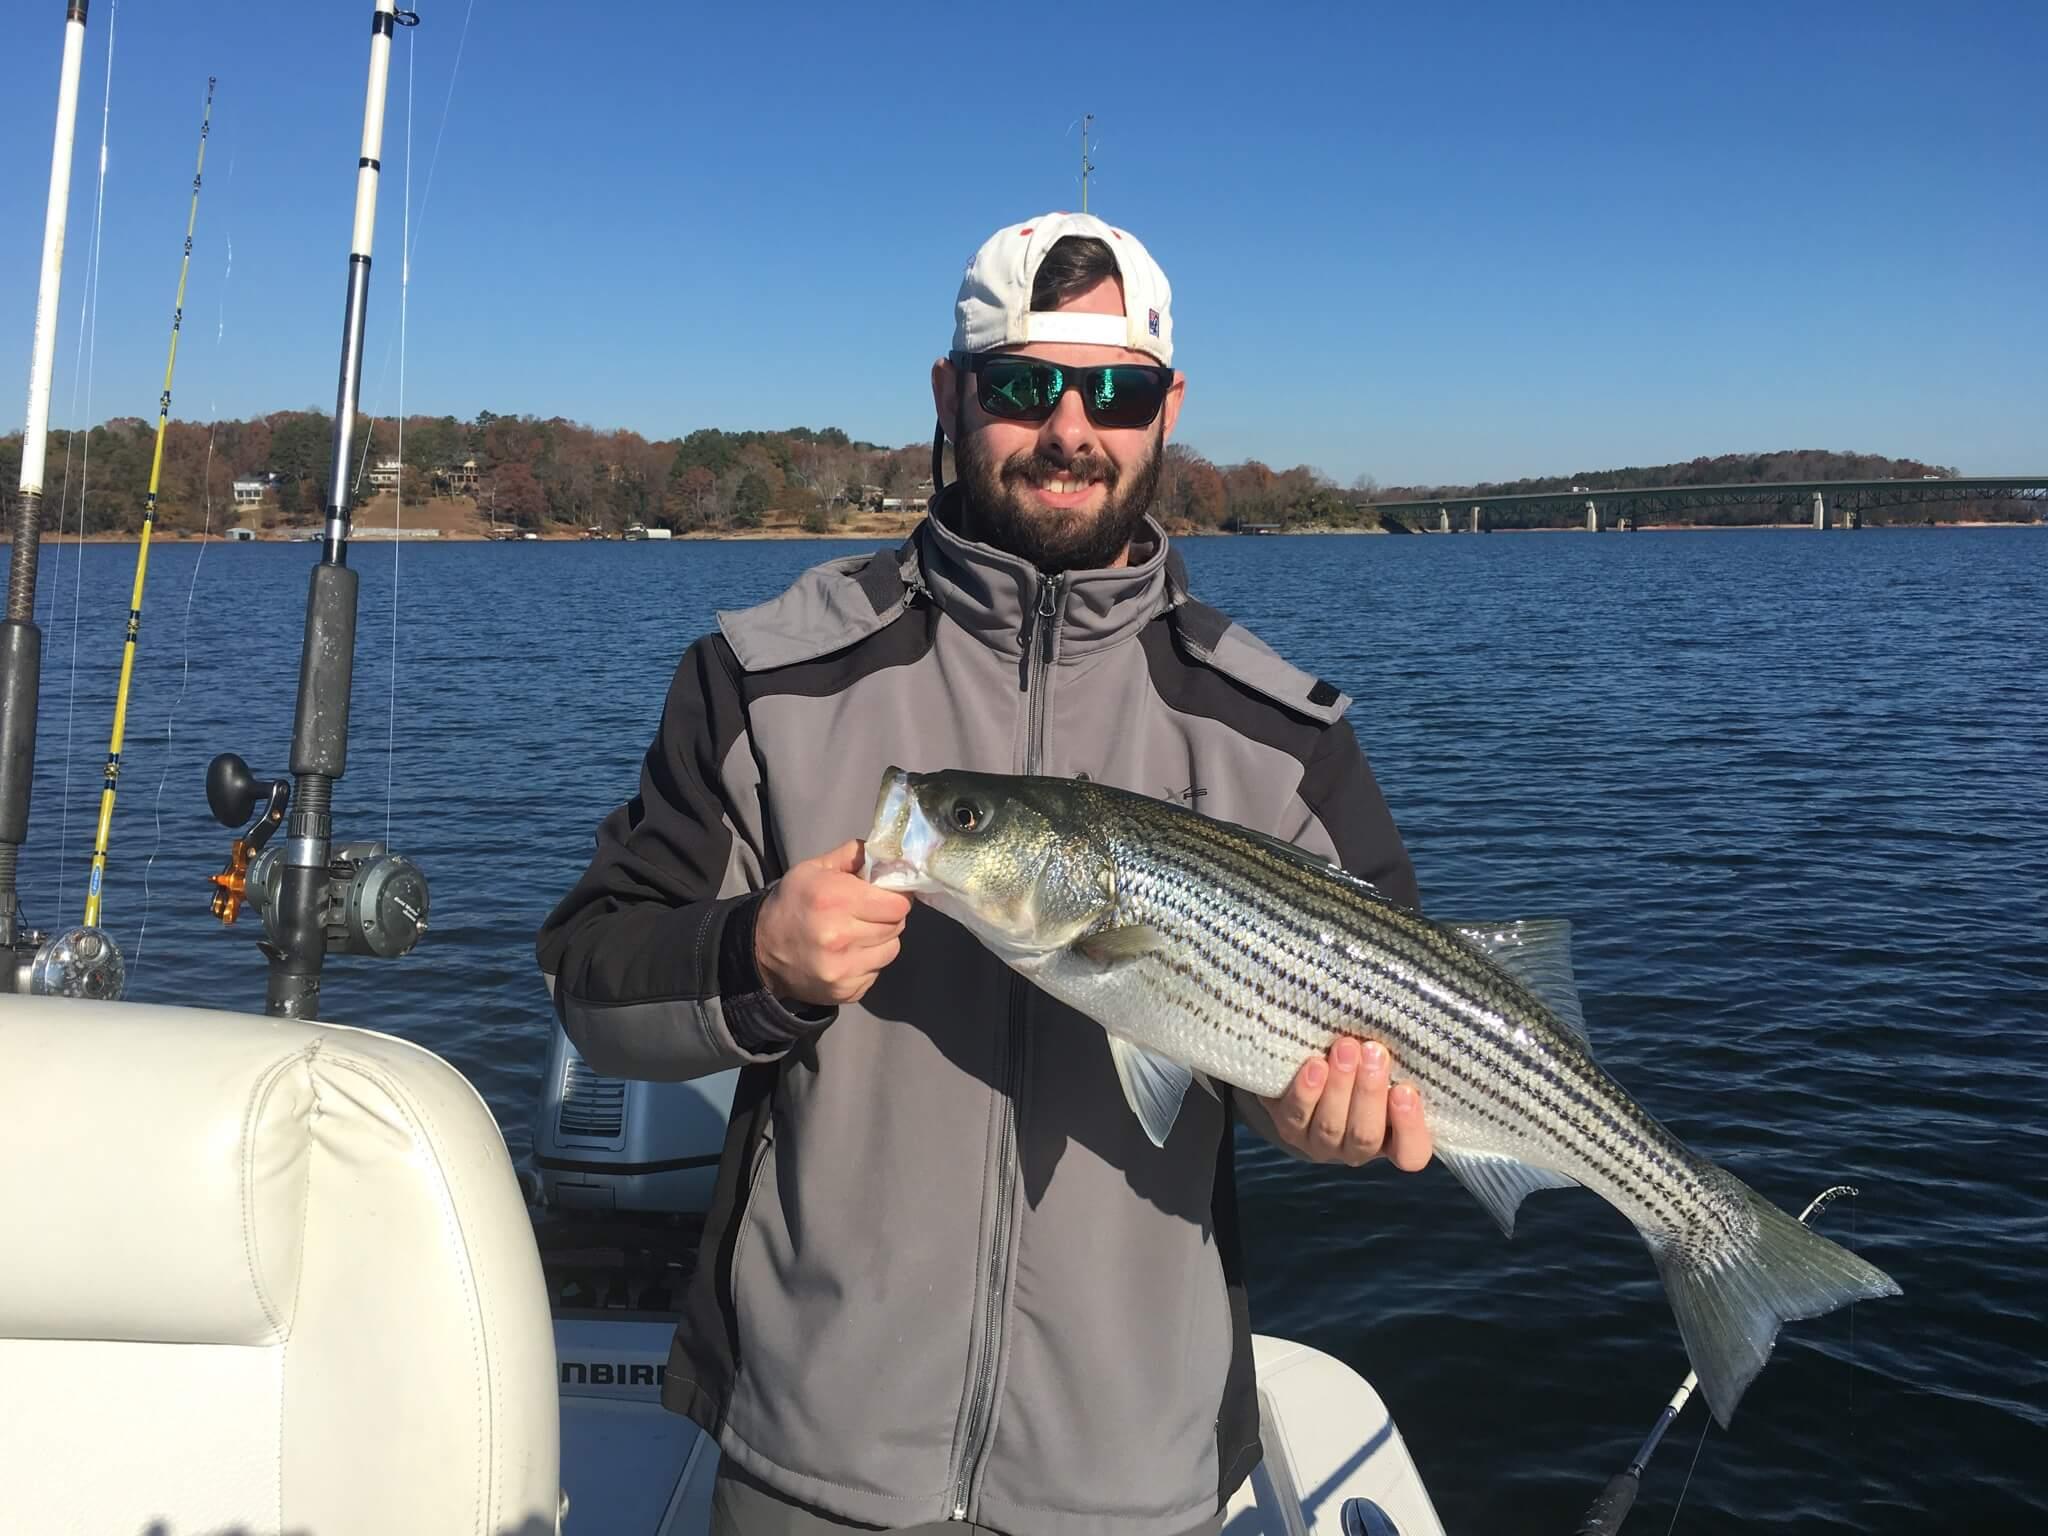 Lake lanier fishing report december 9 2017 captain mack 39 s for Fishing report lake lanier